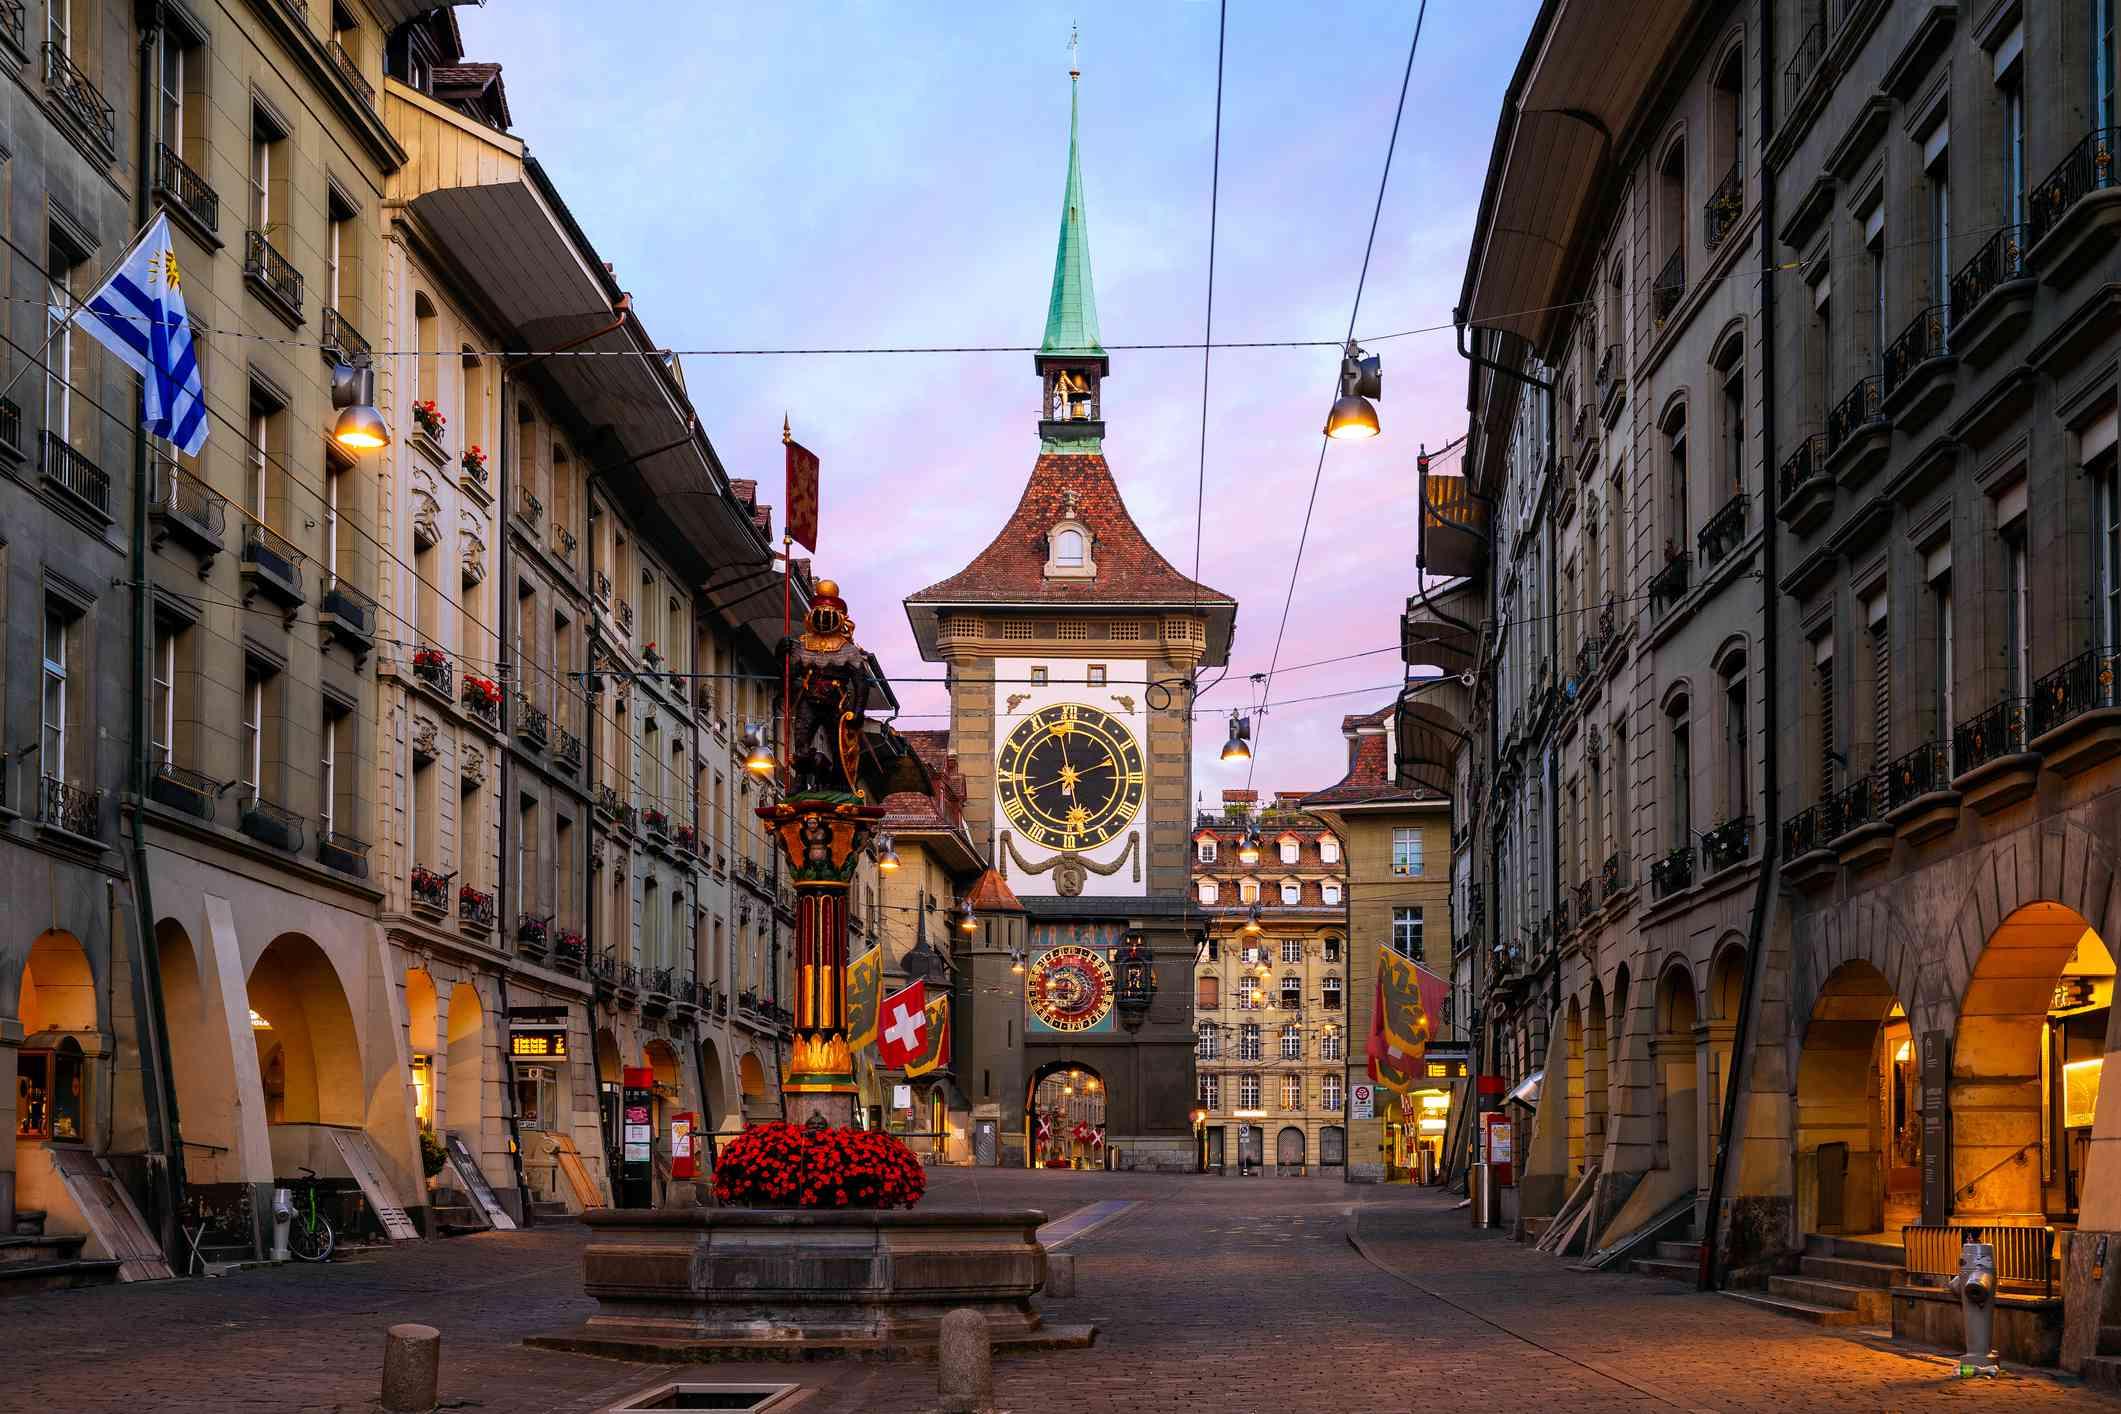 Zytglogge Clock, Bern Switzerland